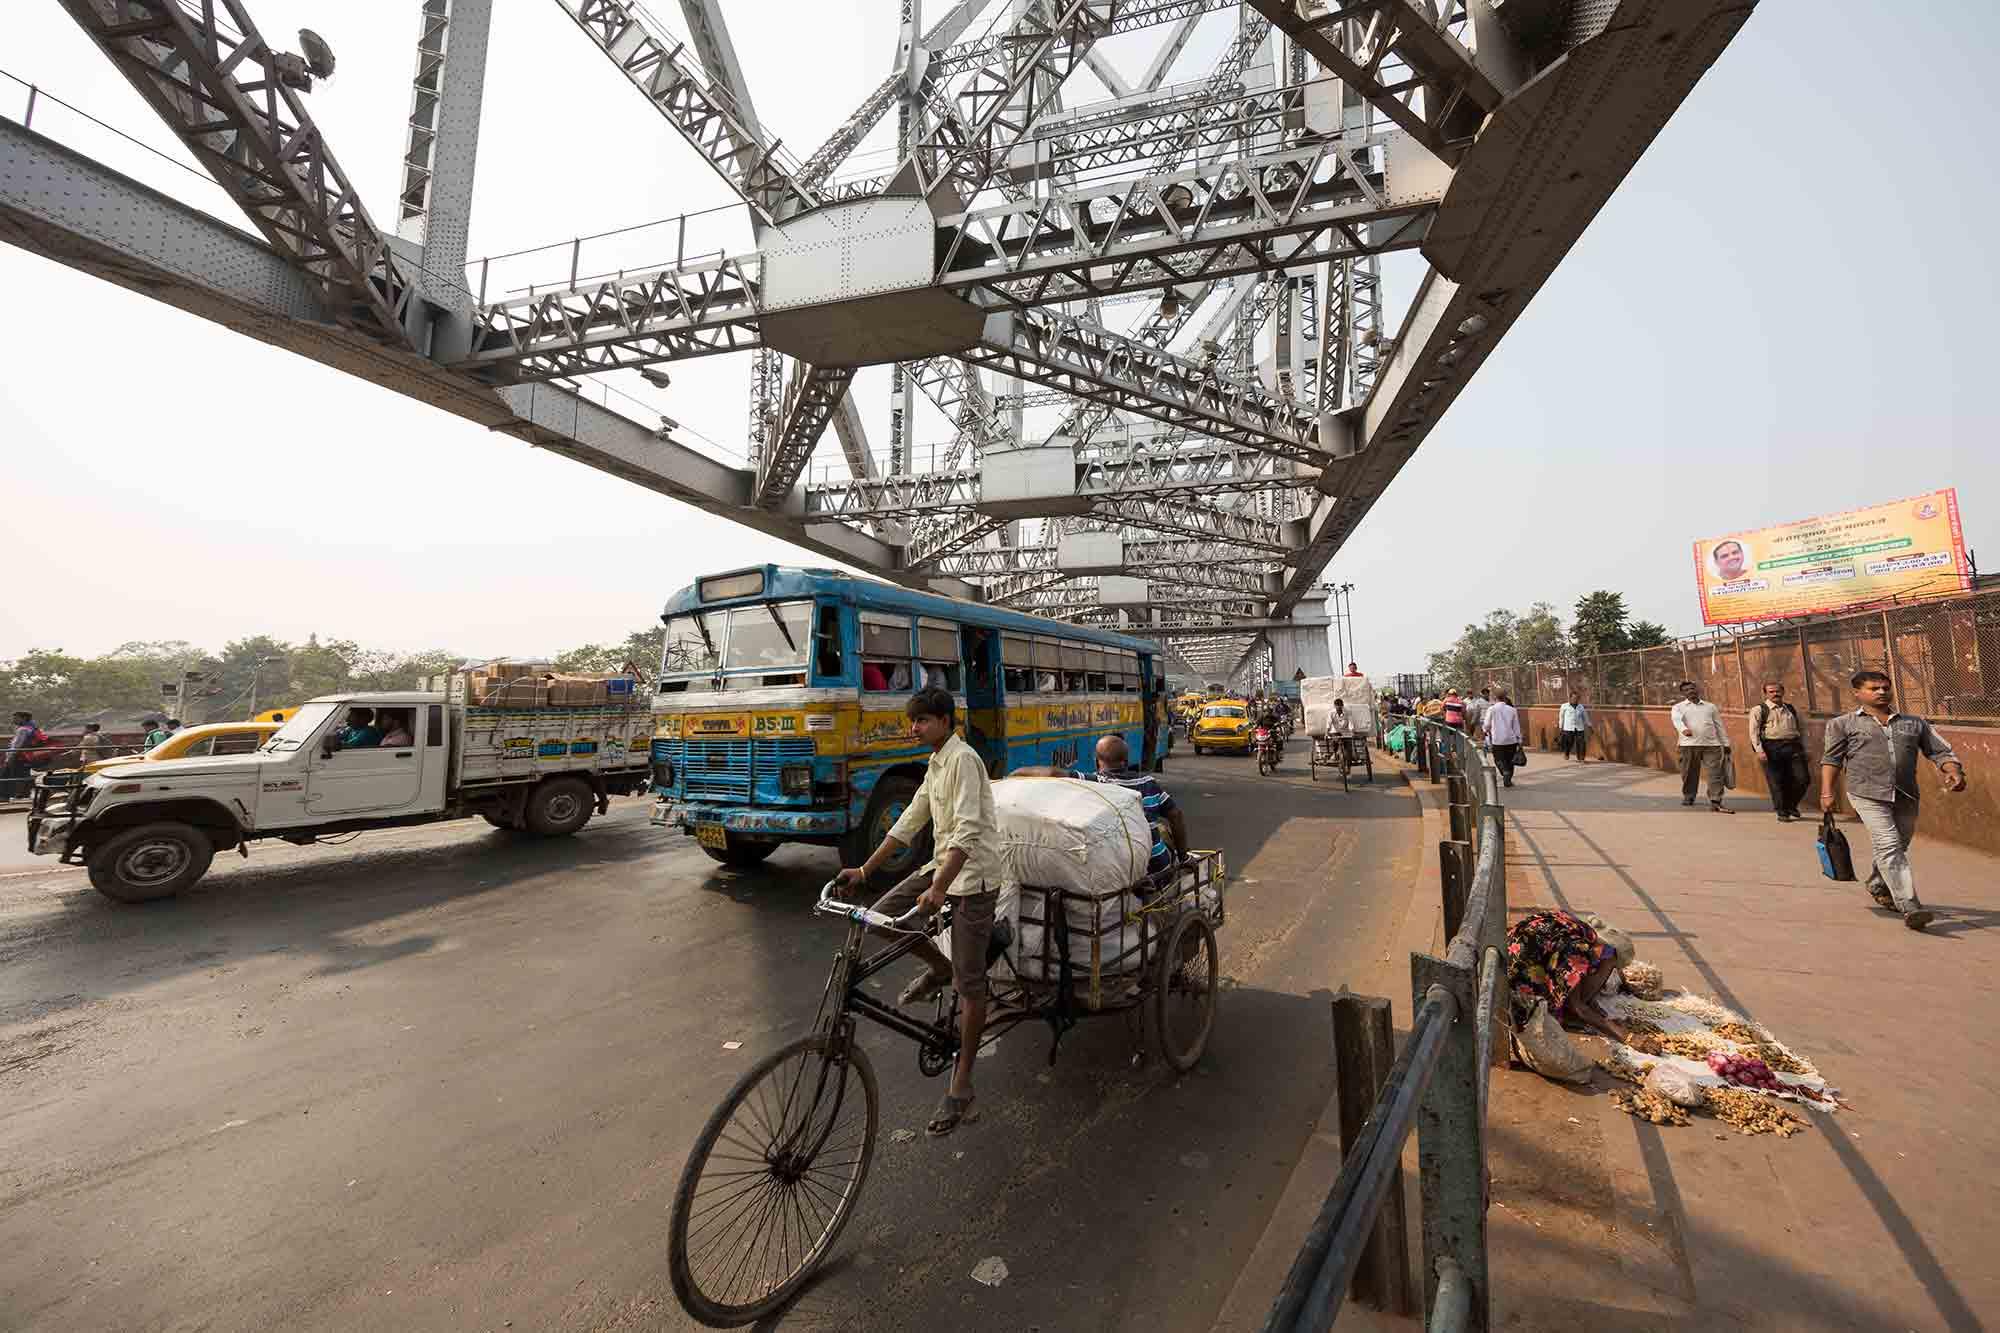 howrah-bridge-kolkata-india